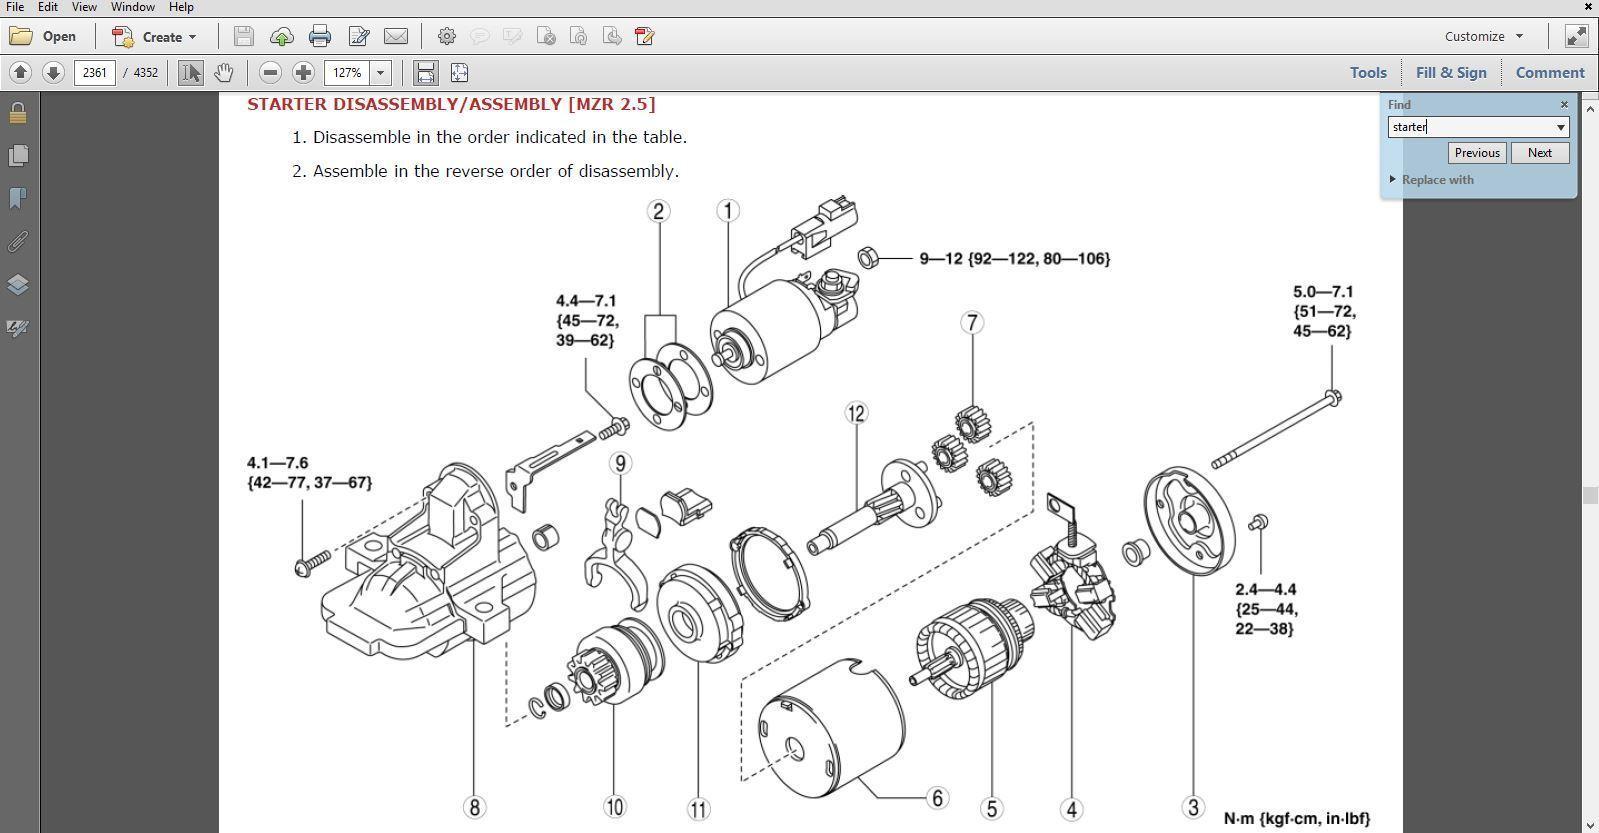 Mazda 3 Service Manual: Non Return Valve Inspection Mzr 2.0, Mzr 2.5